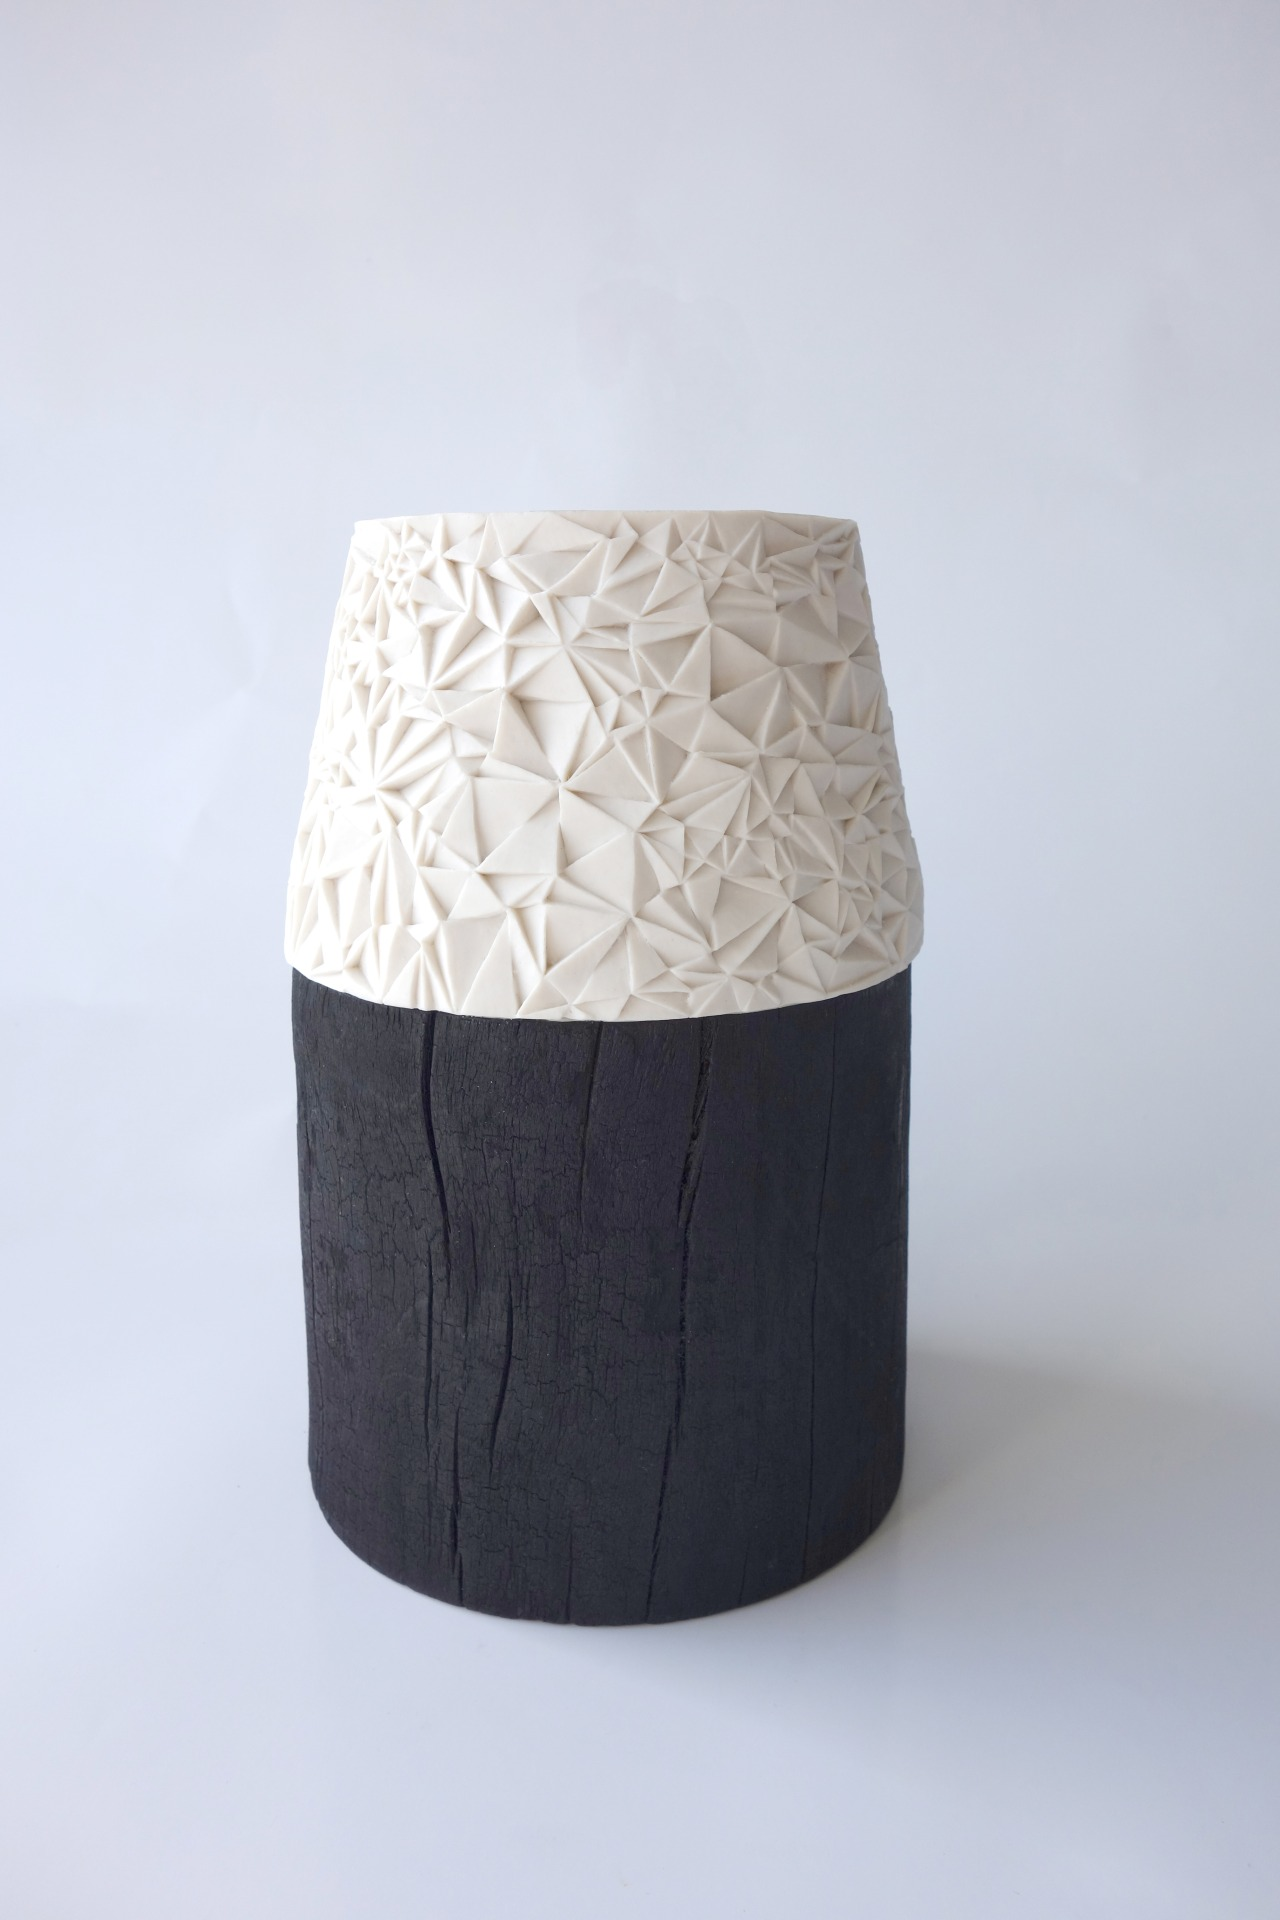 Hand carved porcelain, burnt beech  by Leah Jensen